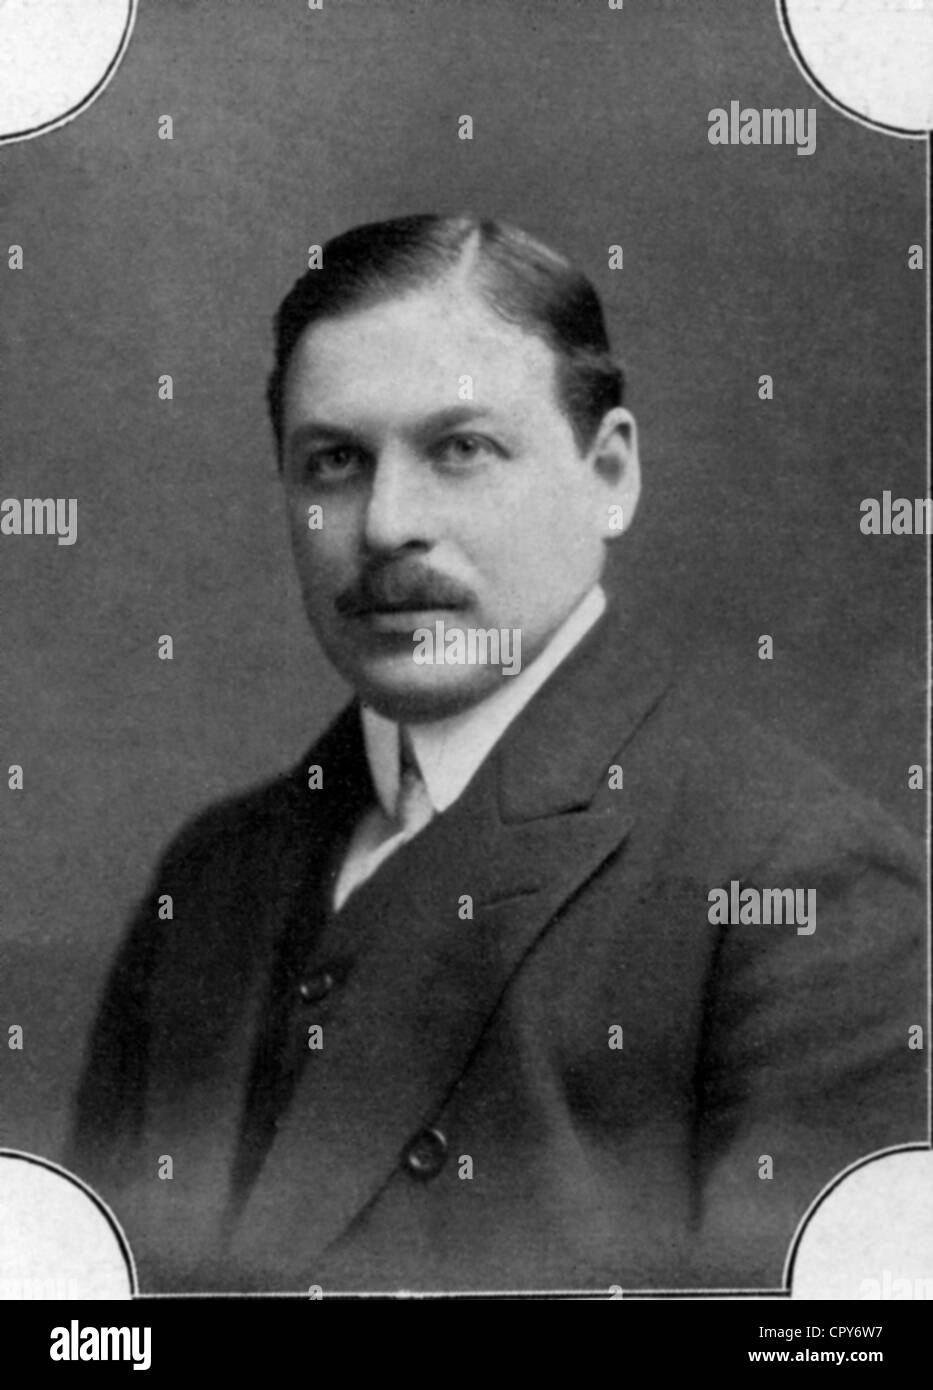 Kalman, Emmerich (Imre), 24.10.1882 - 30.10.1953, Hungarian composer, portrait, photograph by L. Gutmann, Additional - Stock Image